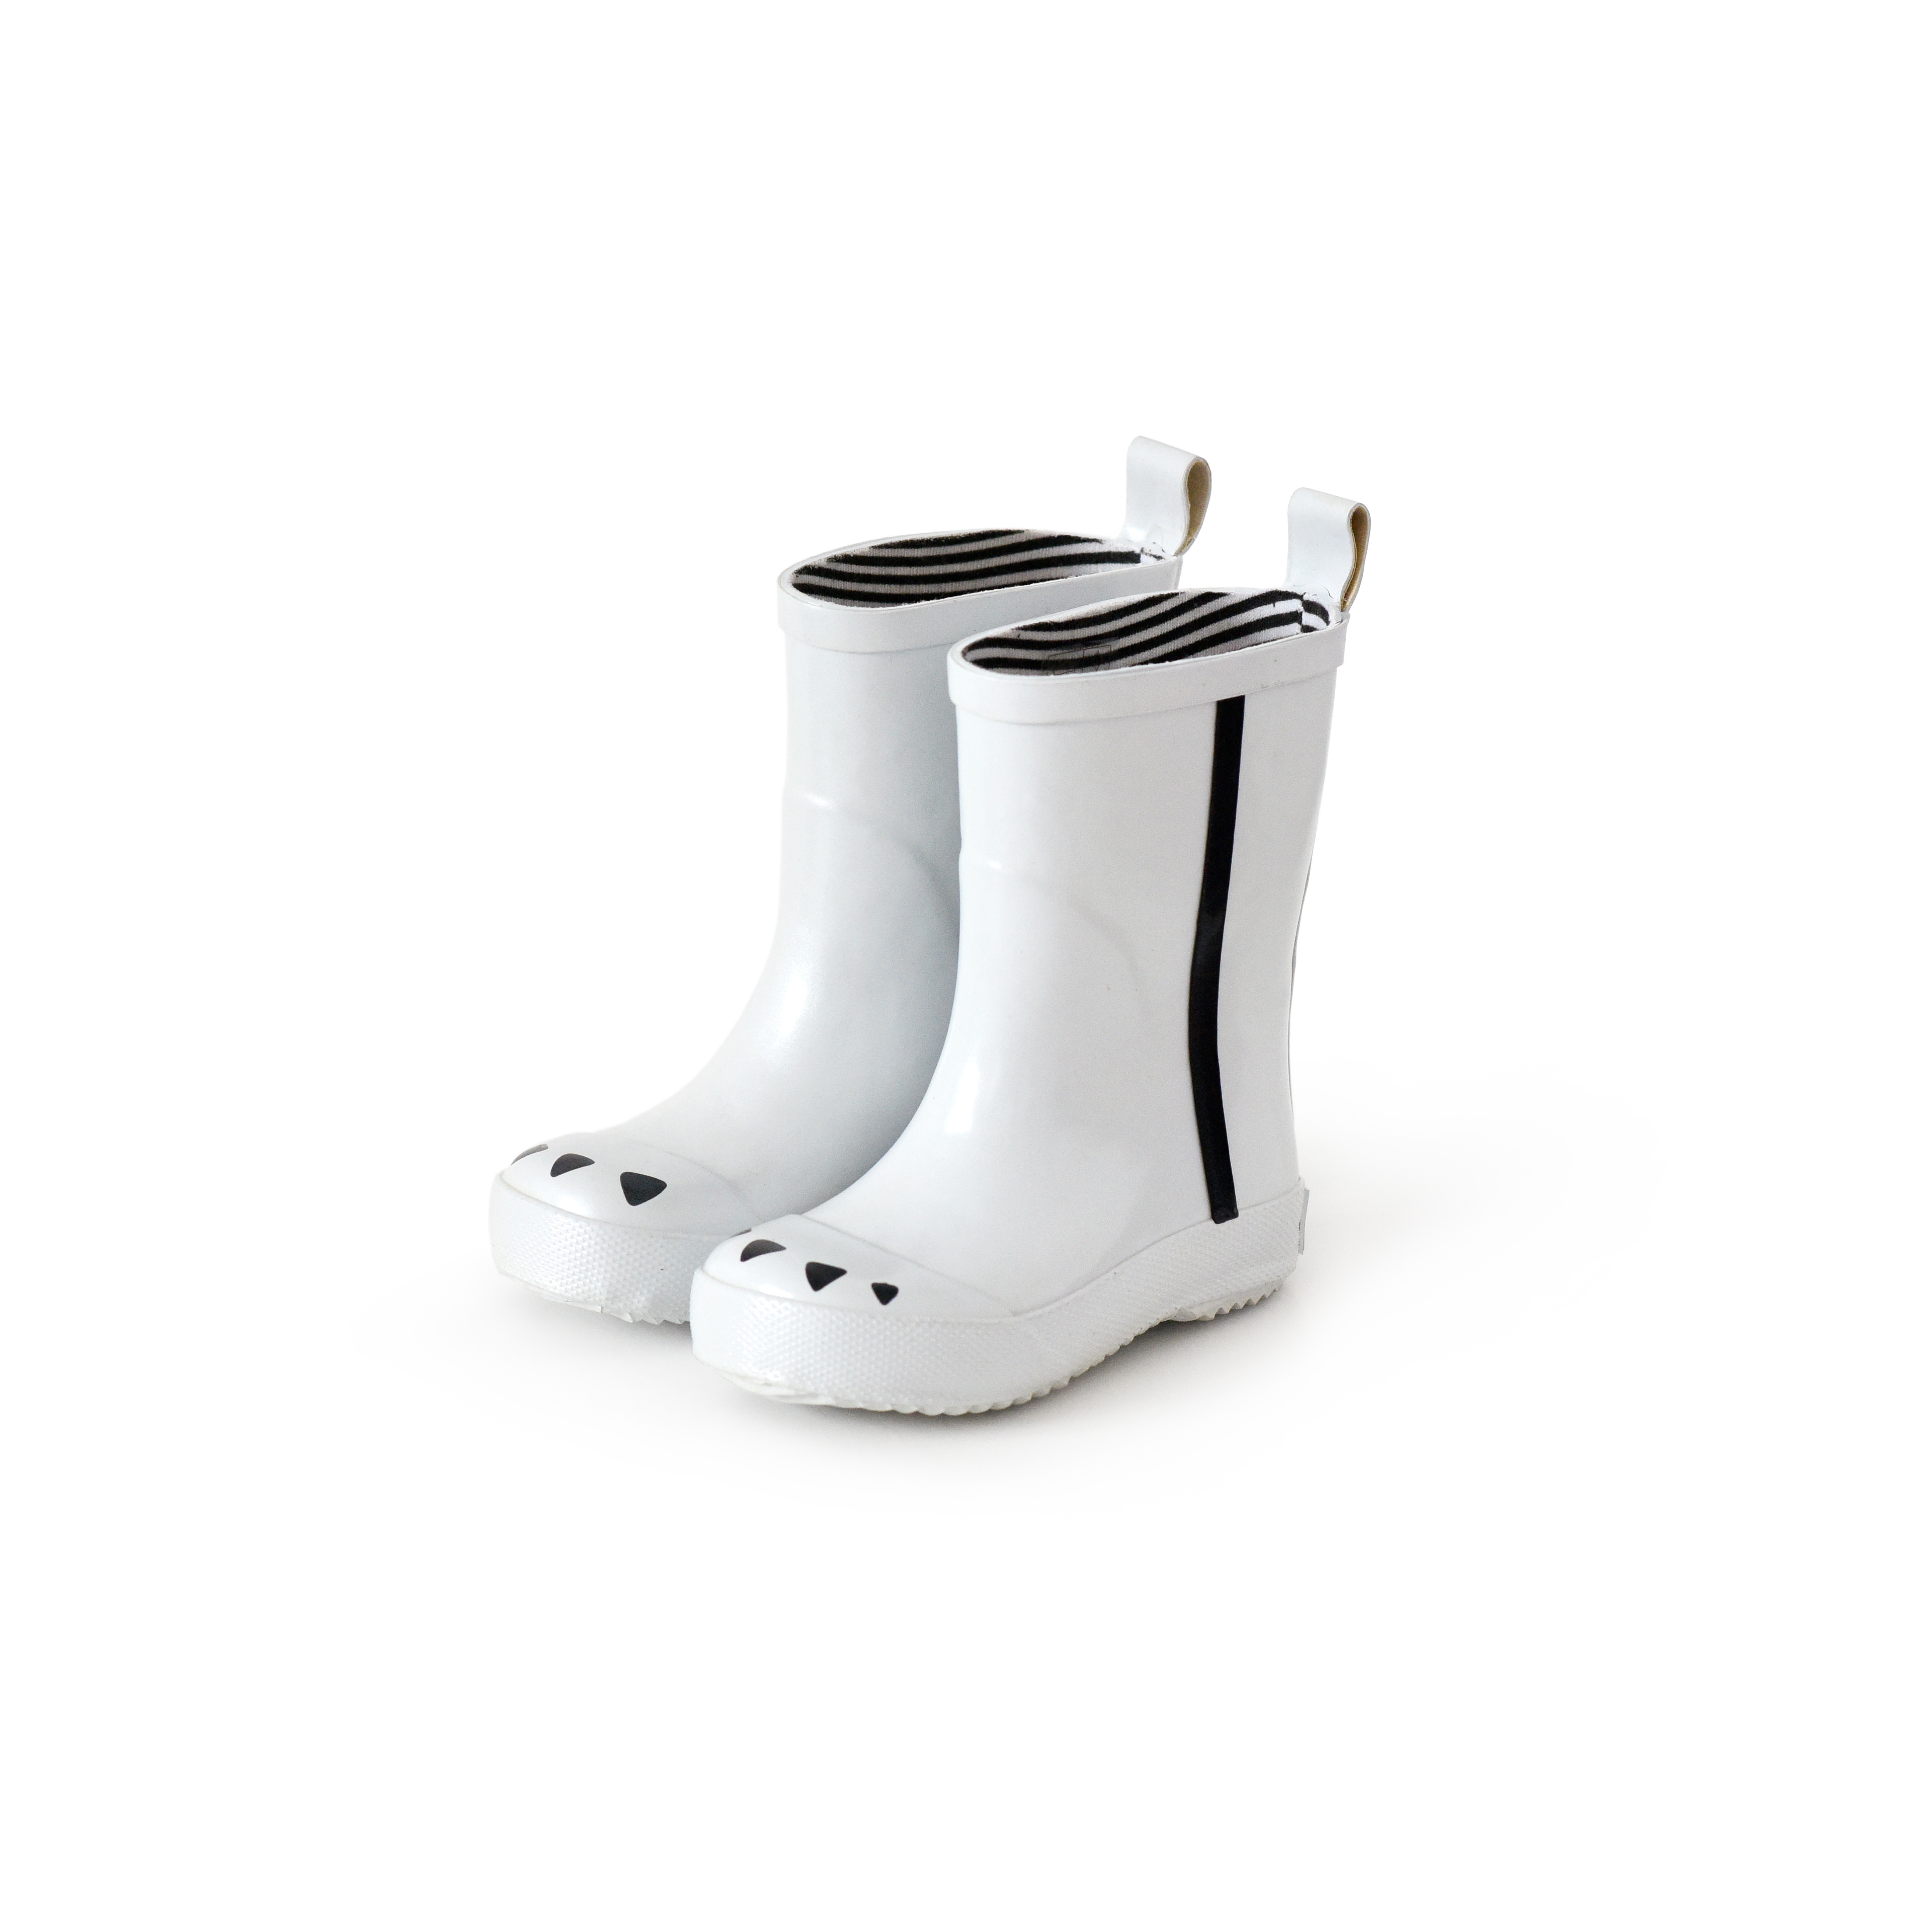 BOXBO法國時尚雨靴 / 經典時尚雨靴-星際銀